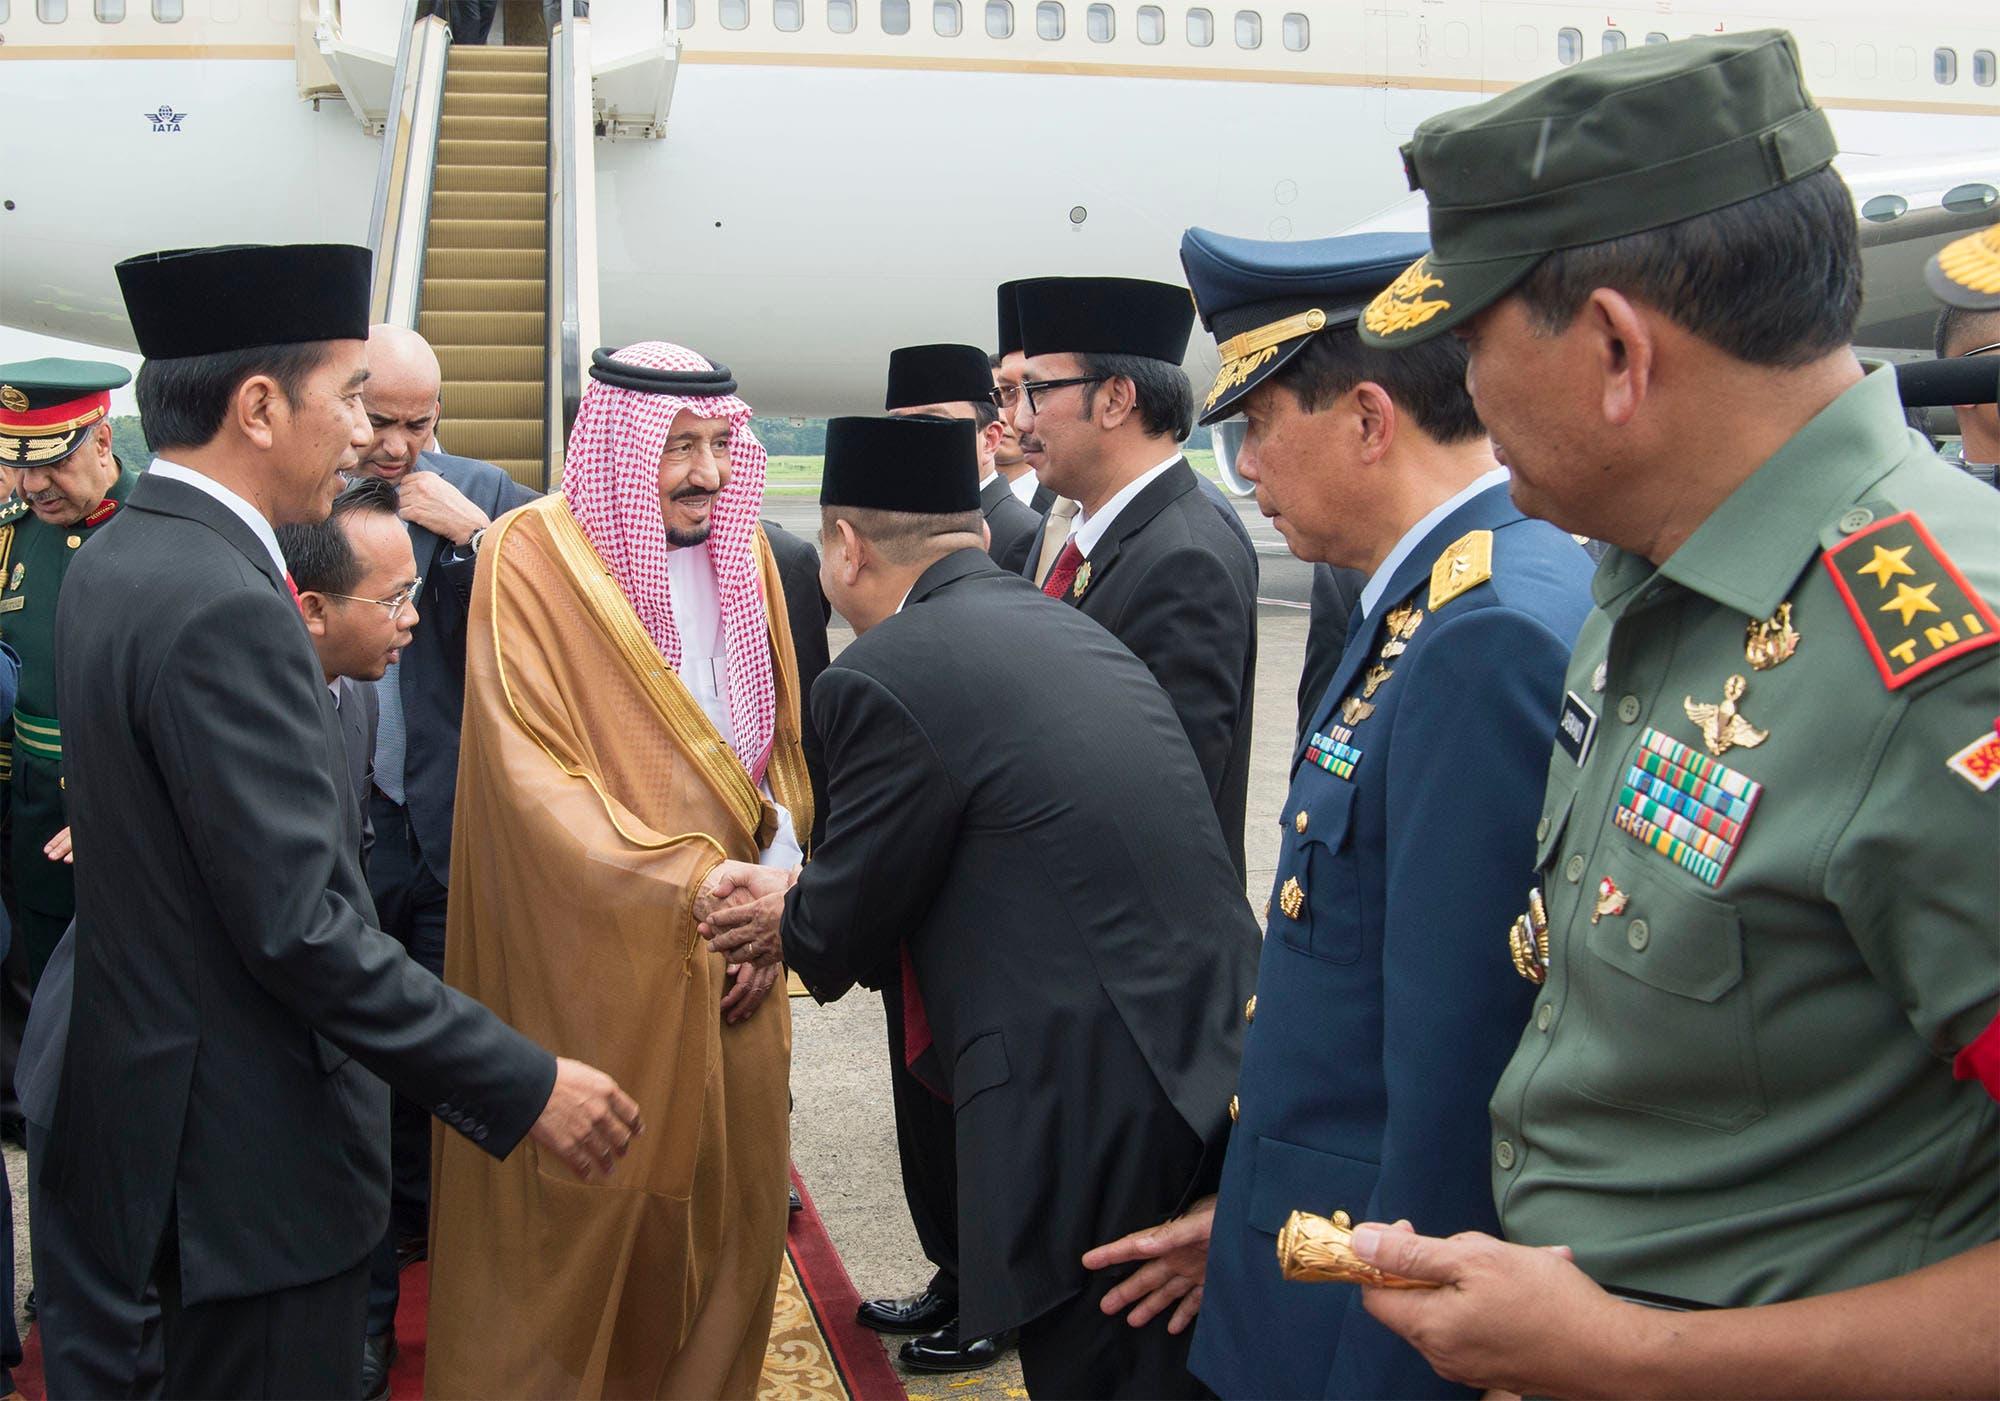 King Salman bin Abdul Aziz arrives at Halim airport in Jakarta on March 1, 2017. (SPA)